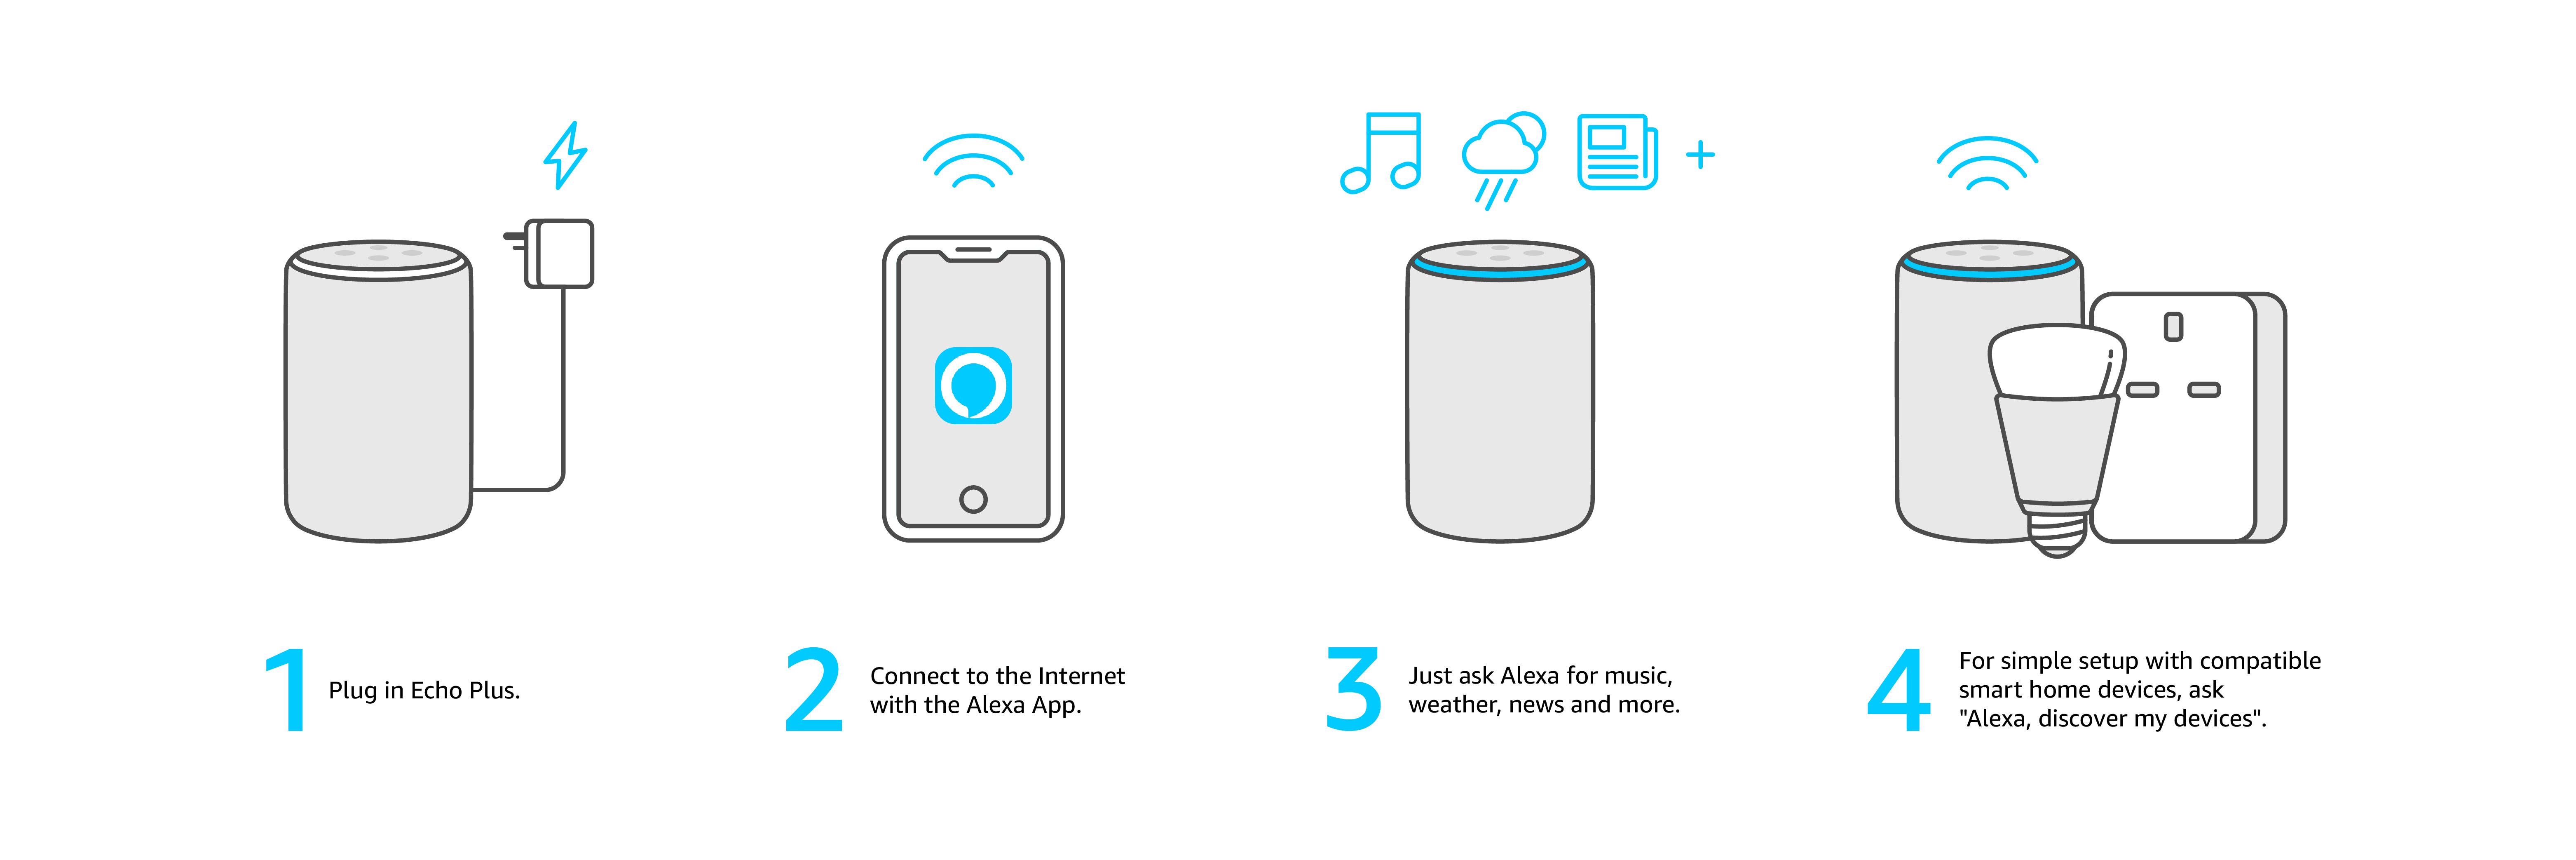 f75fec86a32 Echo Plus (2nd Gen) - Premium sound with a built-in smart home hub ...